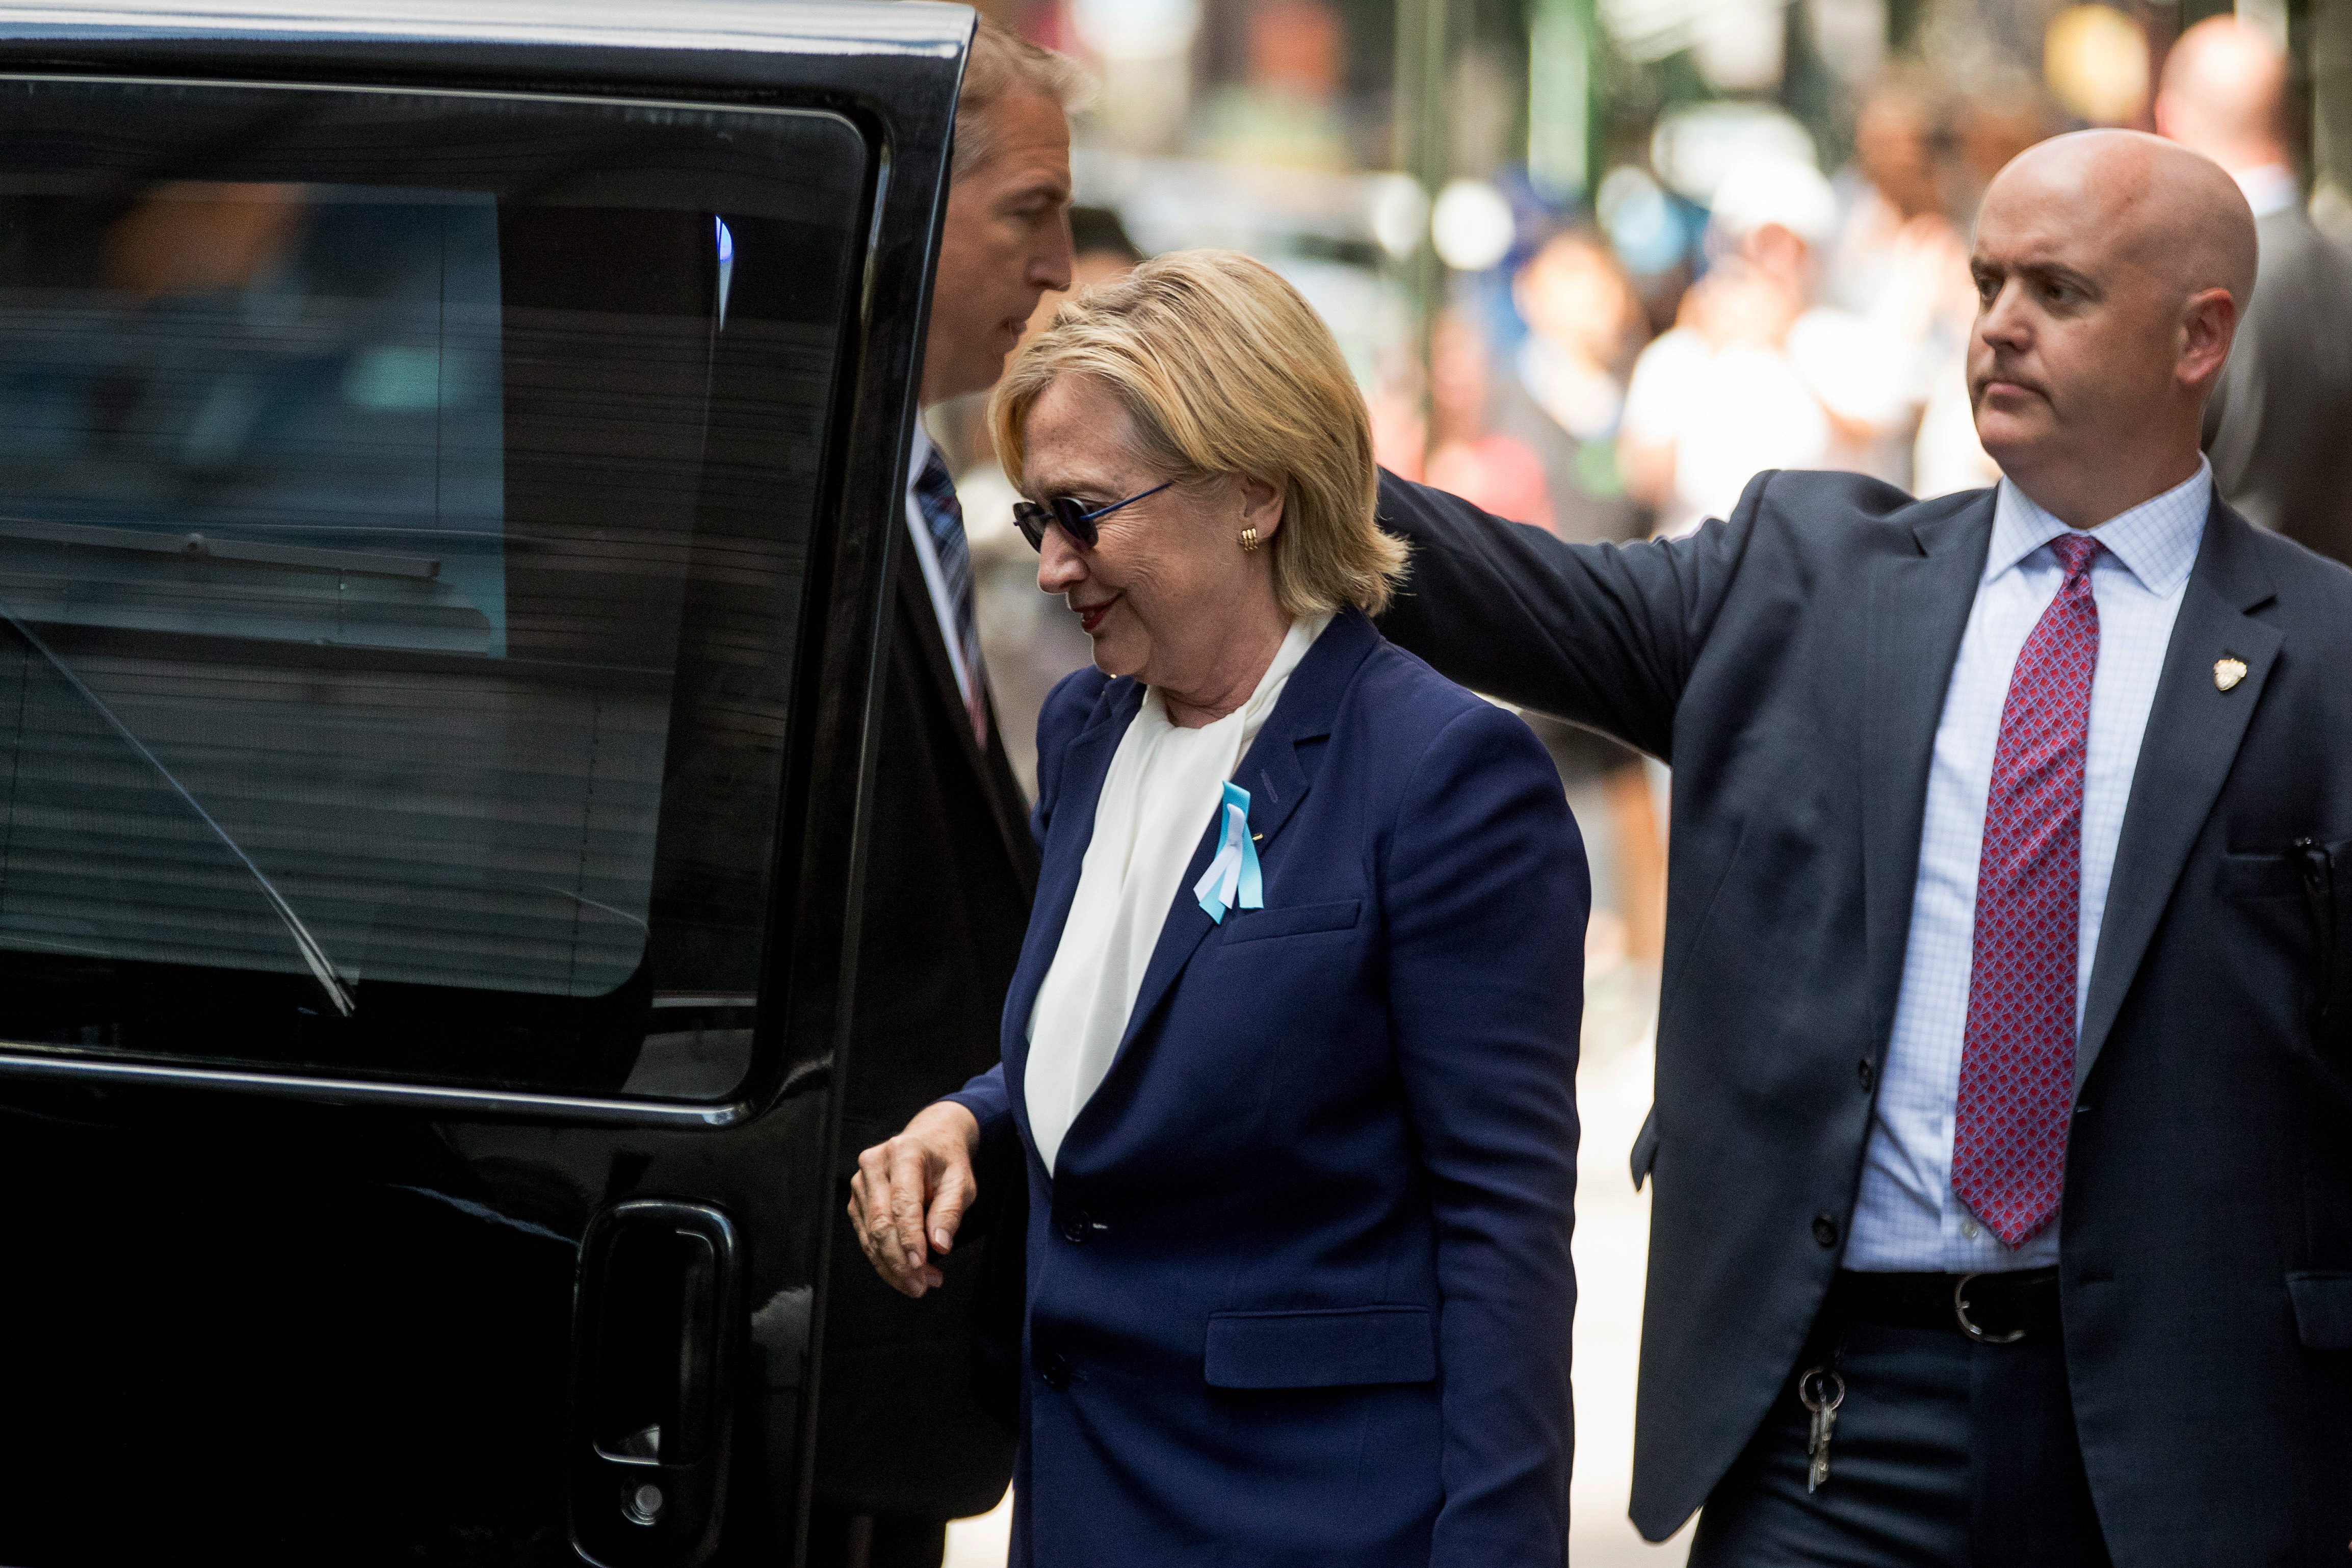 Doctors: Pneumonia is serious but Clinton should bounce back